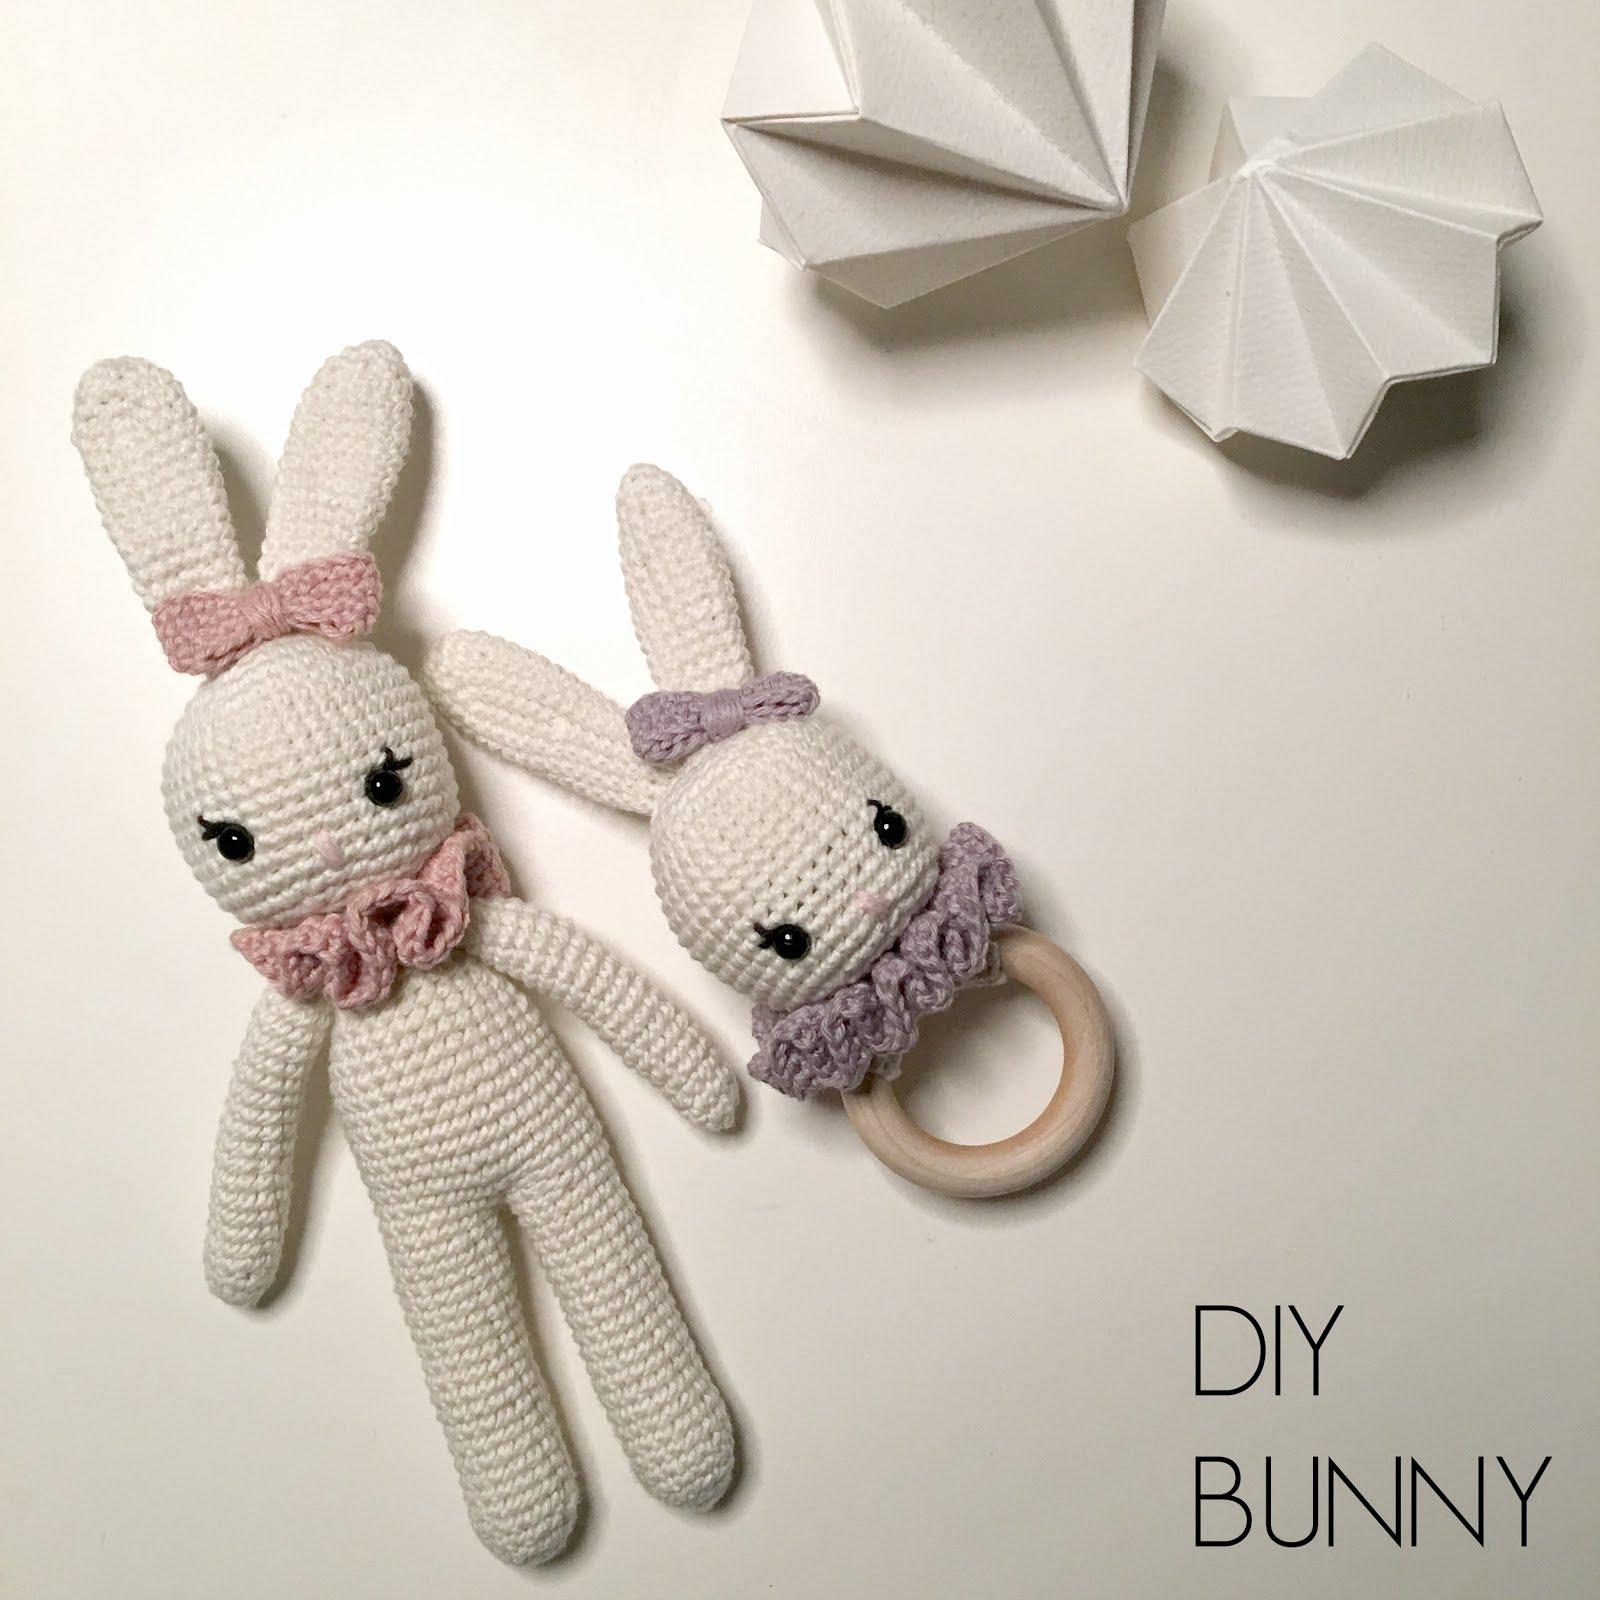 DIY Bunny & rattle